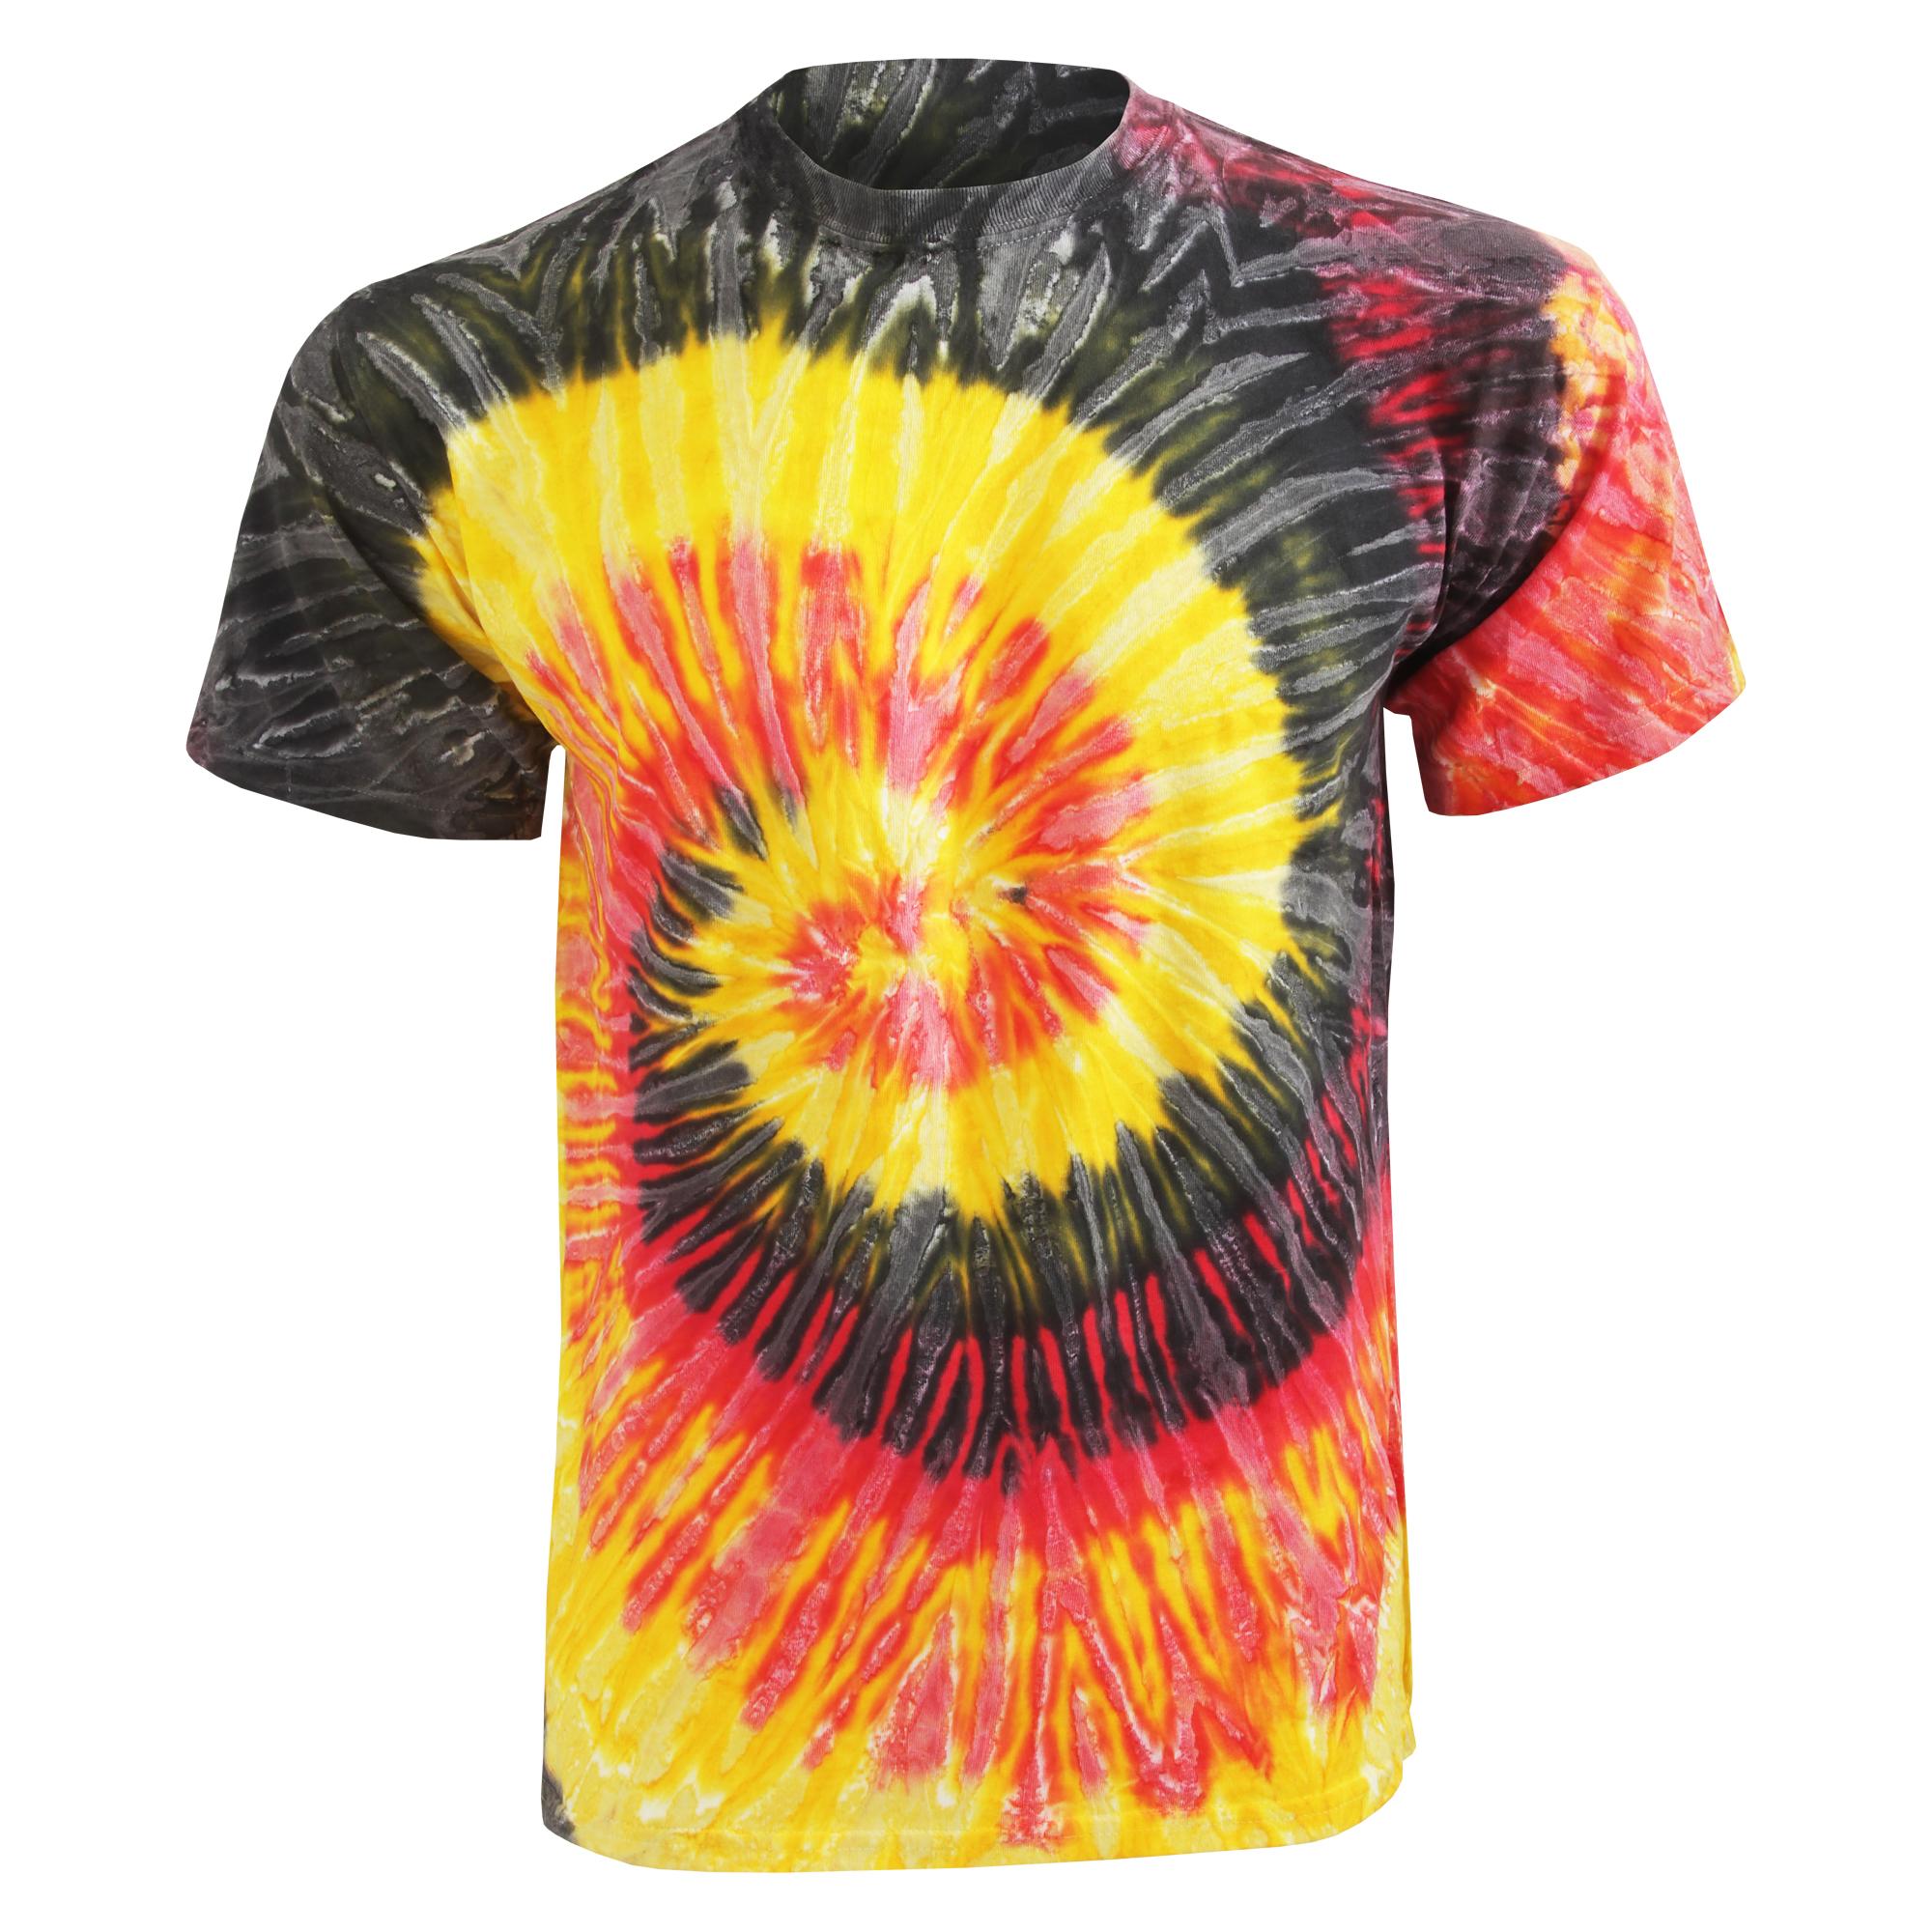 Design your own t shirt ebay - Colortone Womens Ladies Rainbow Tie Dye Short Sleeve